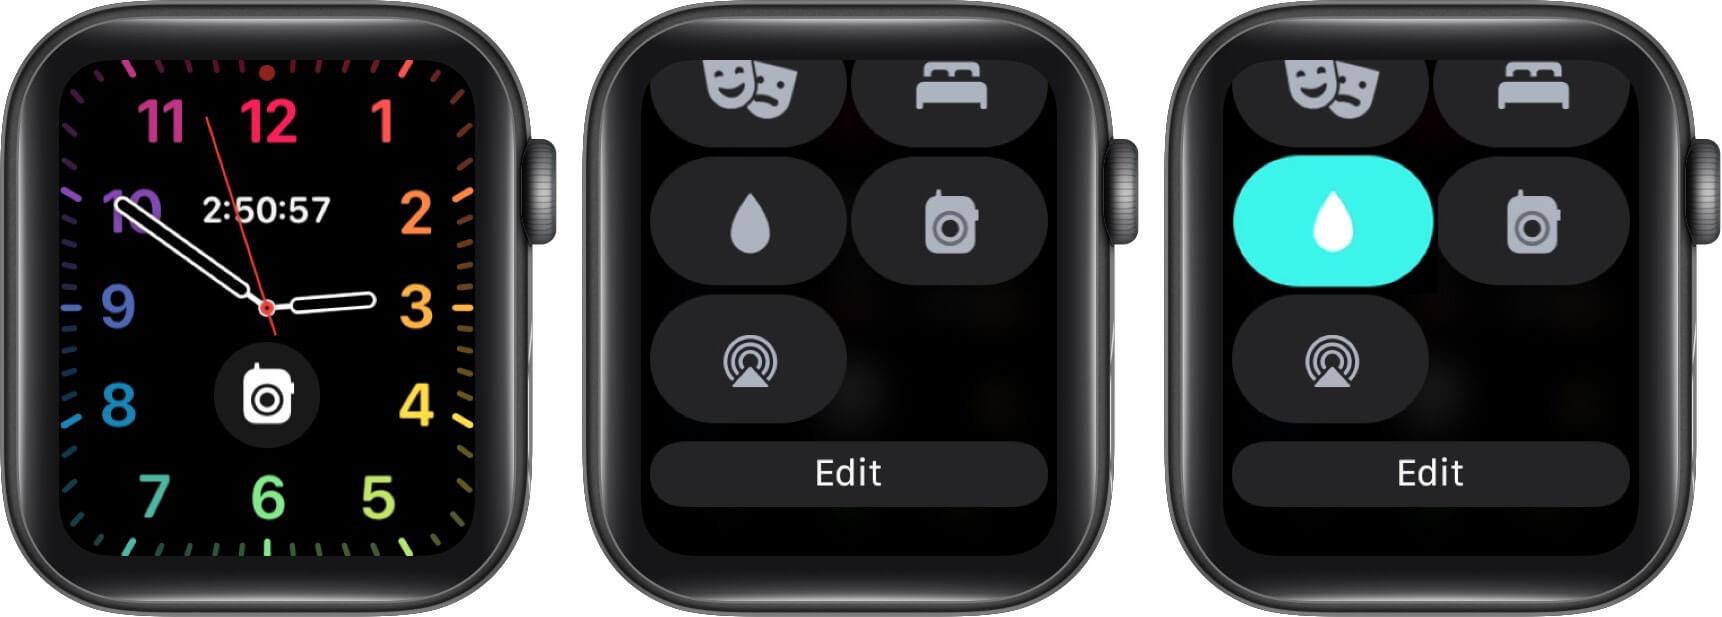 Bloqueo acuático Apple Watch